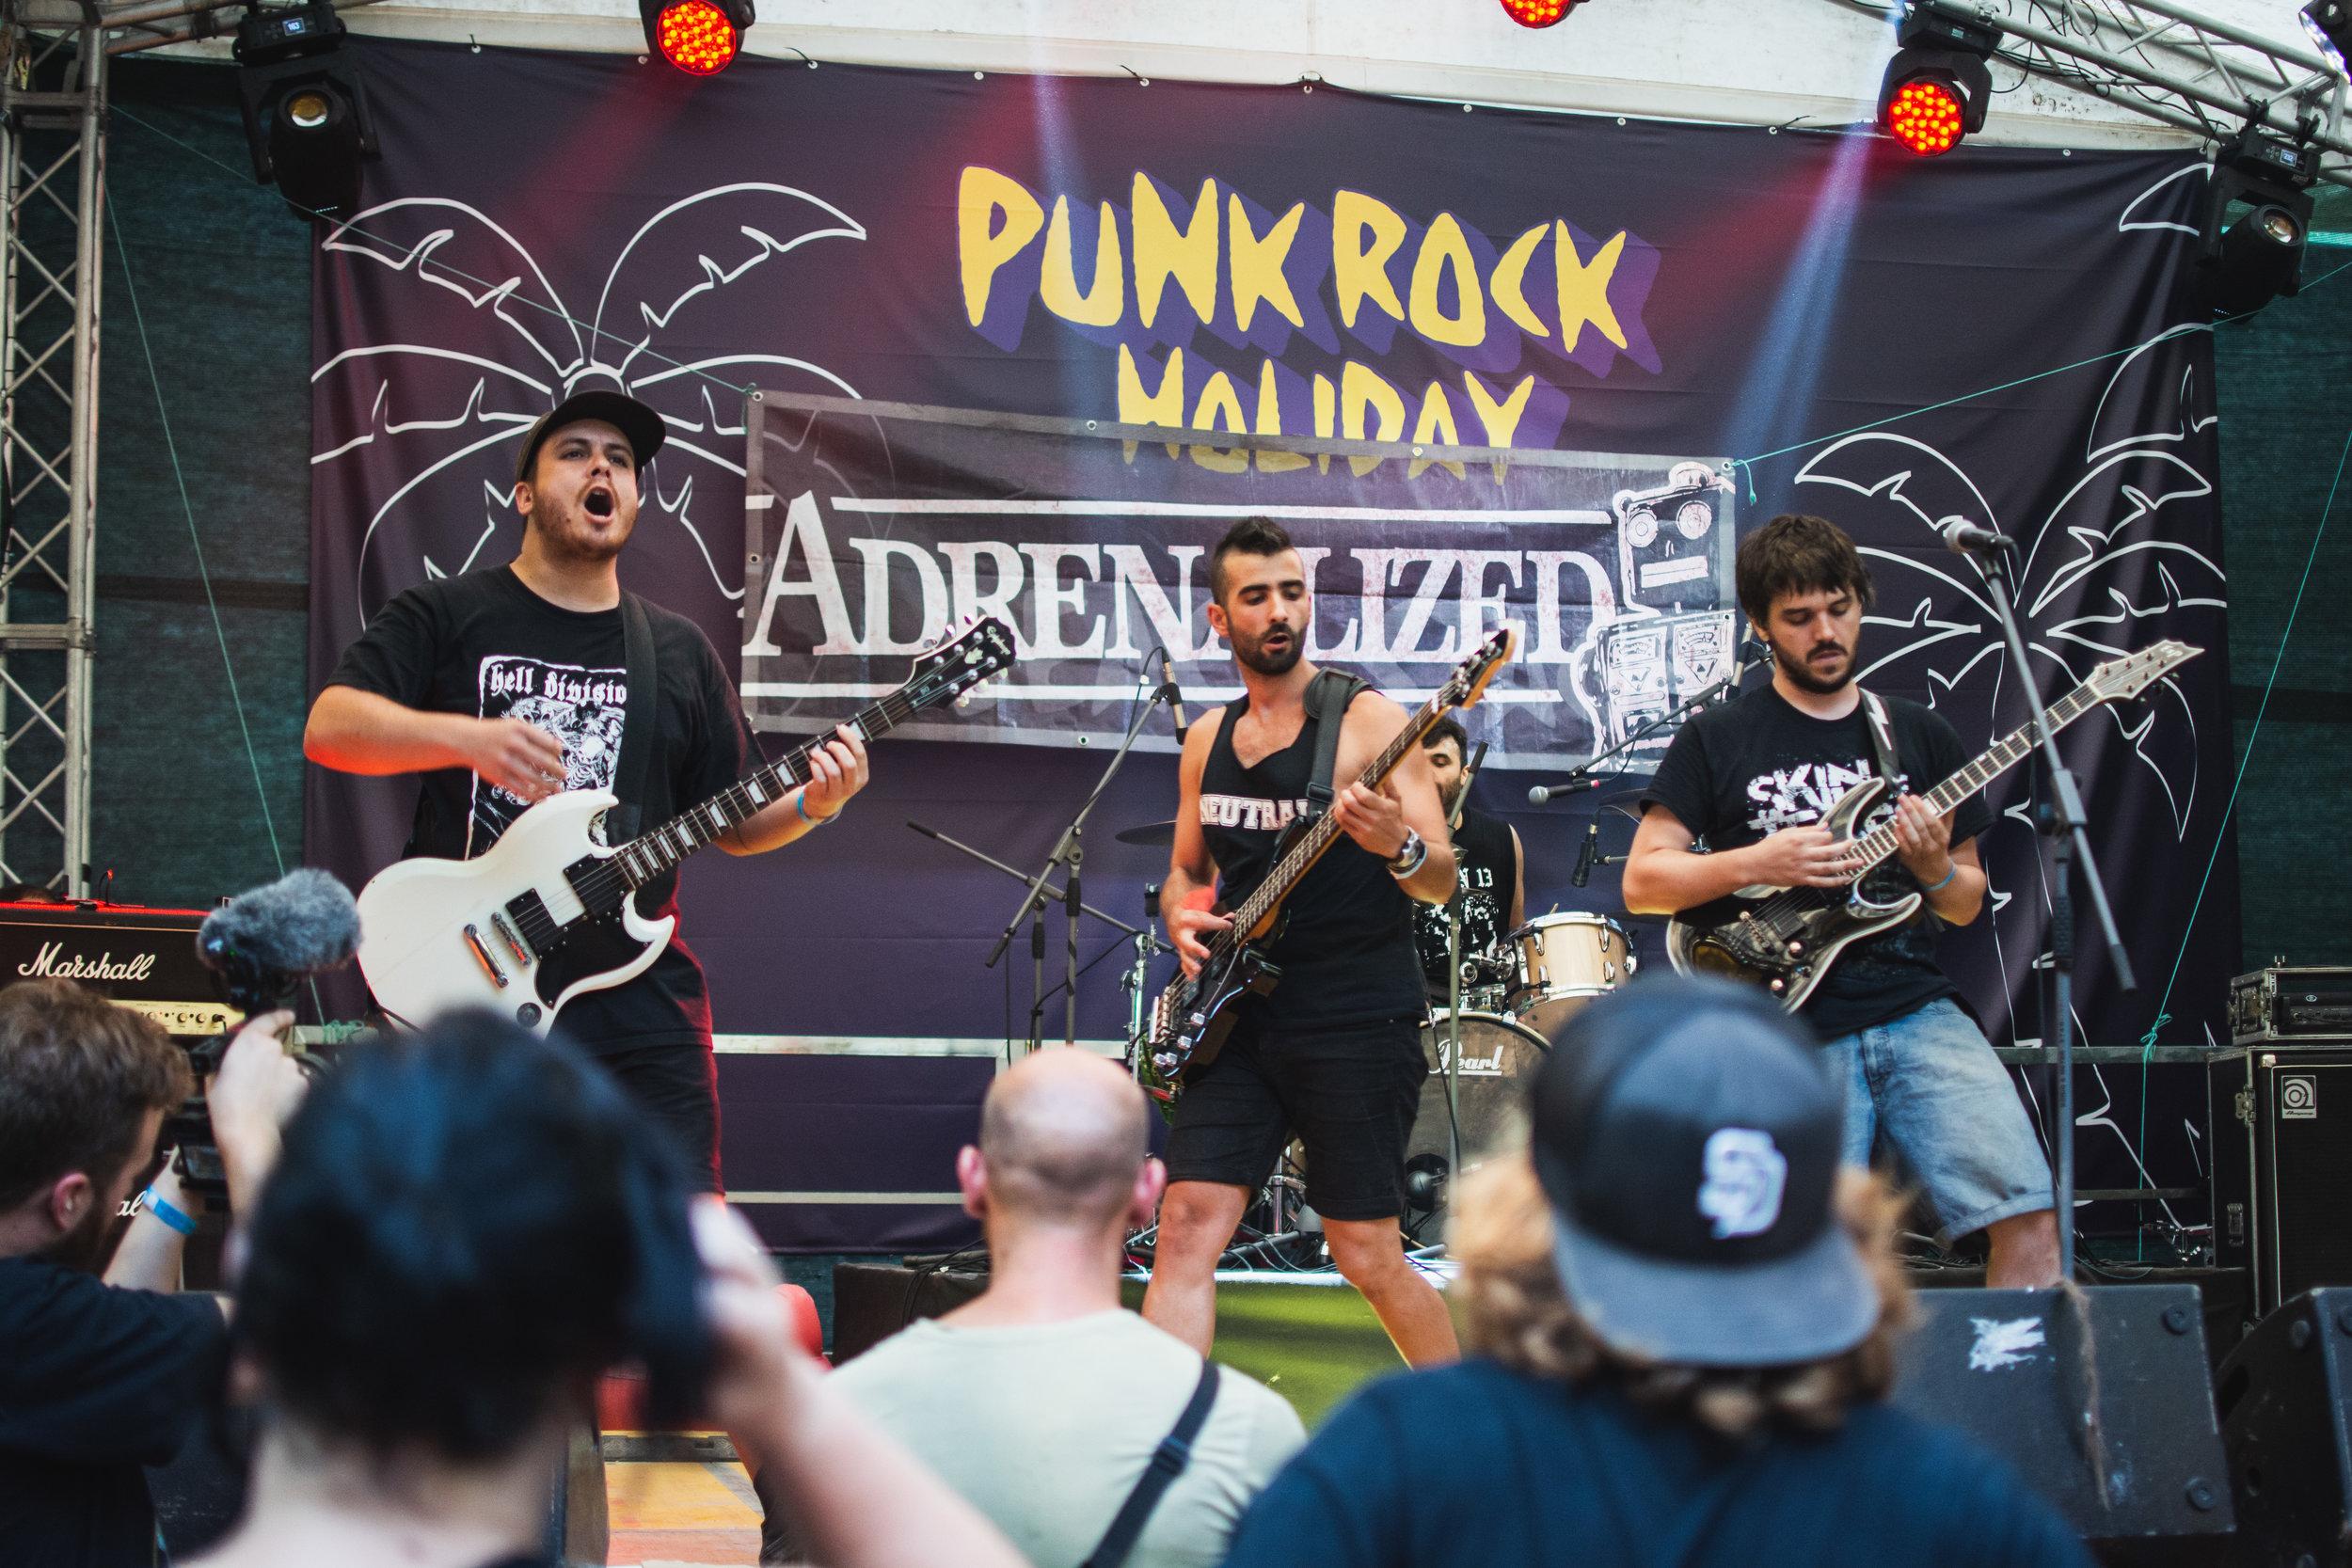 Punk-Rock-Holiday-Thursday_6_2018August 09, 2018.jpg